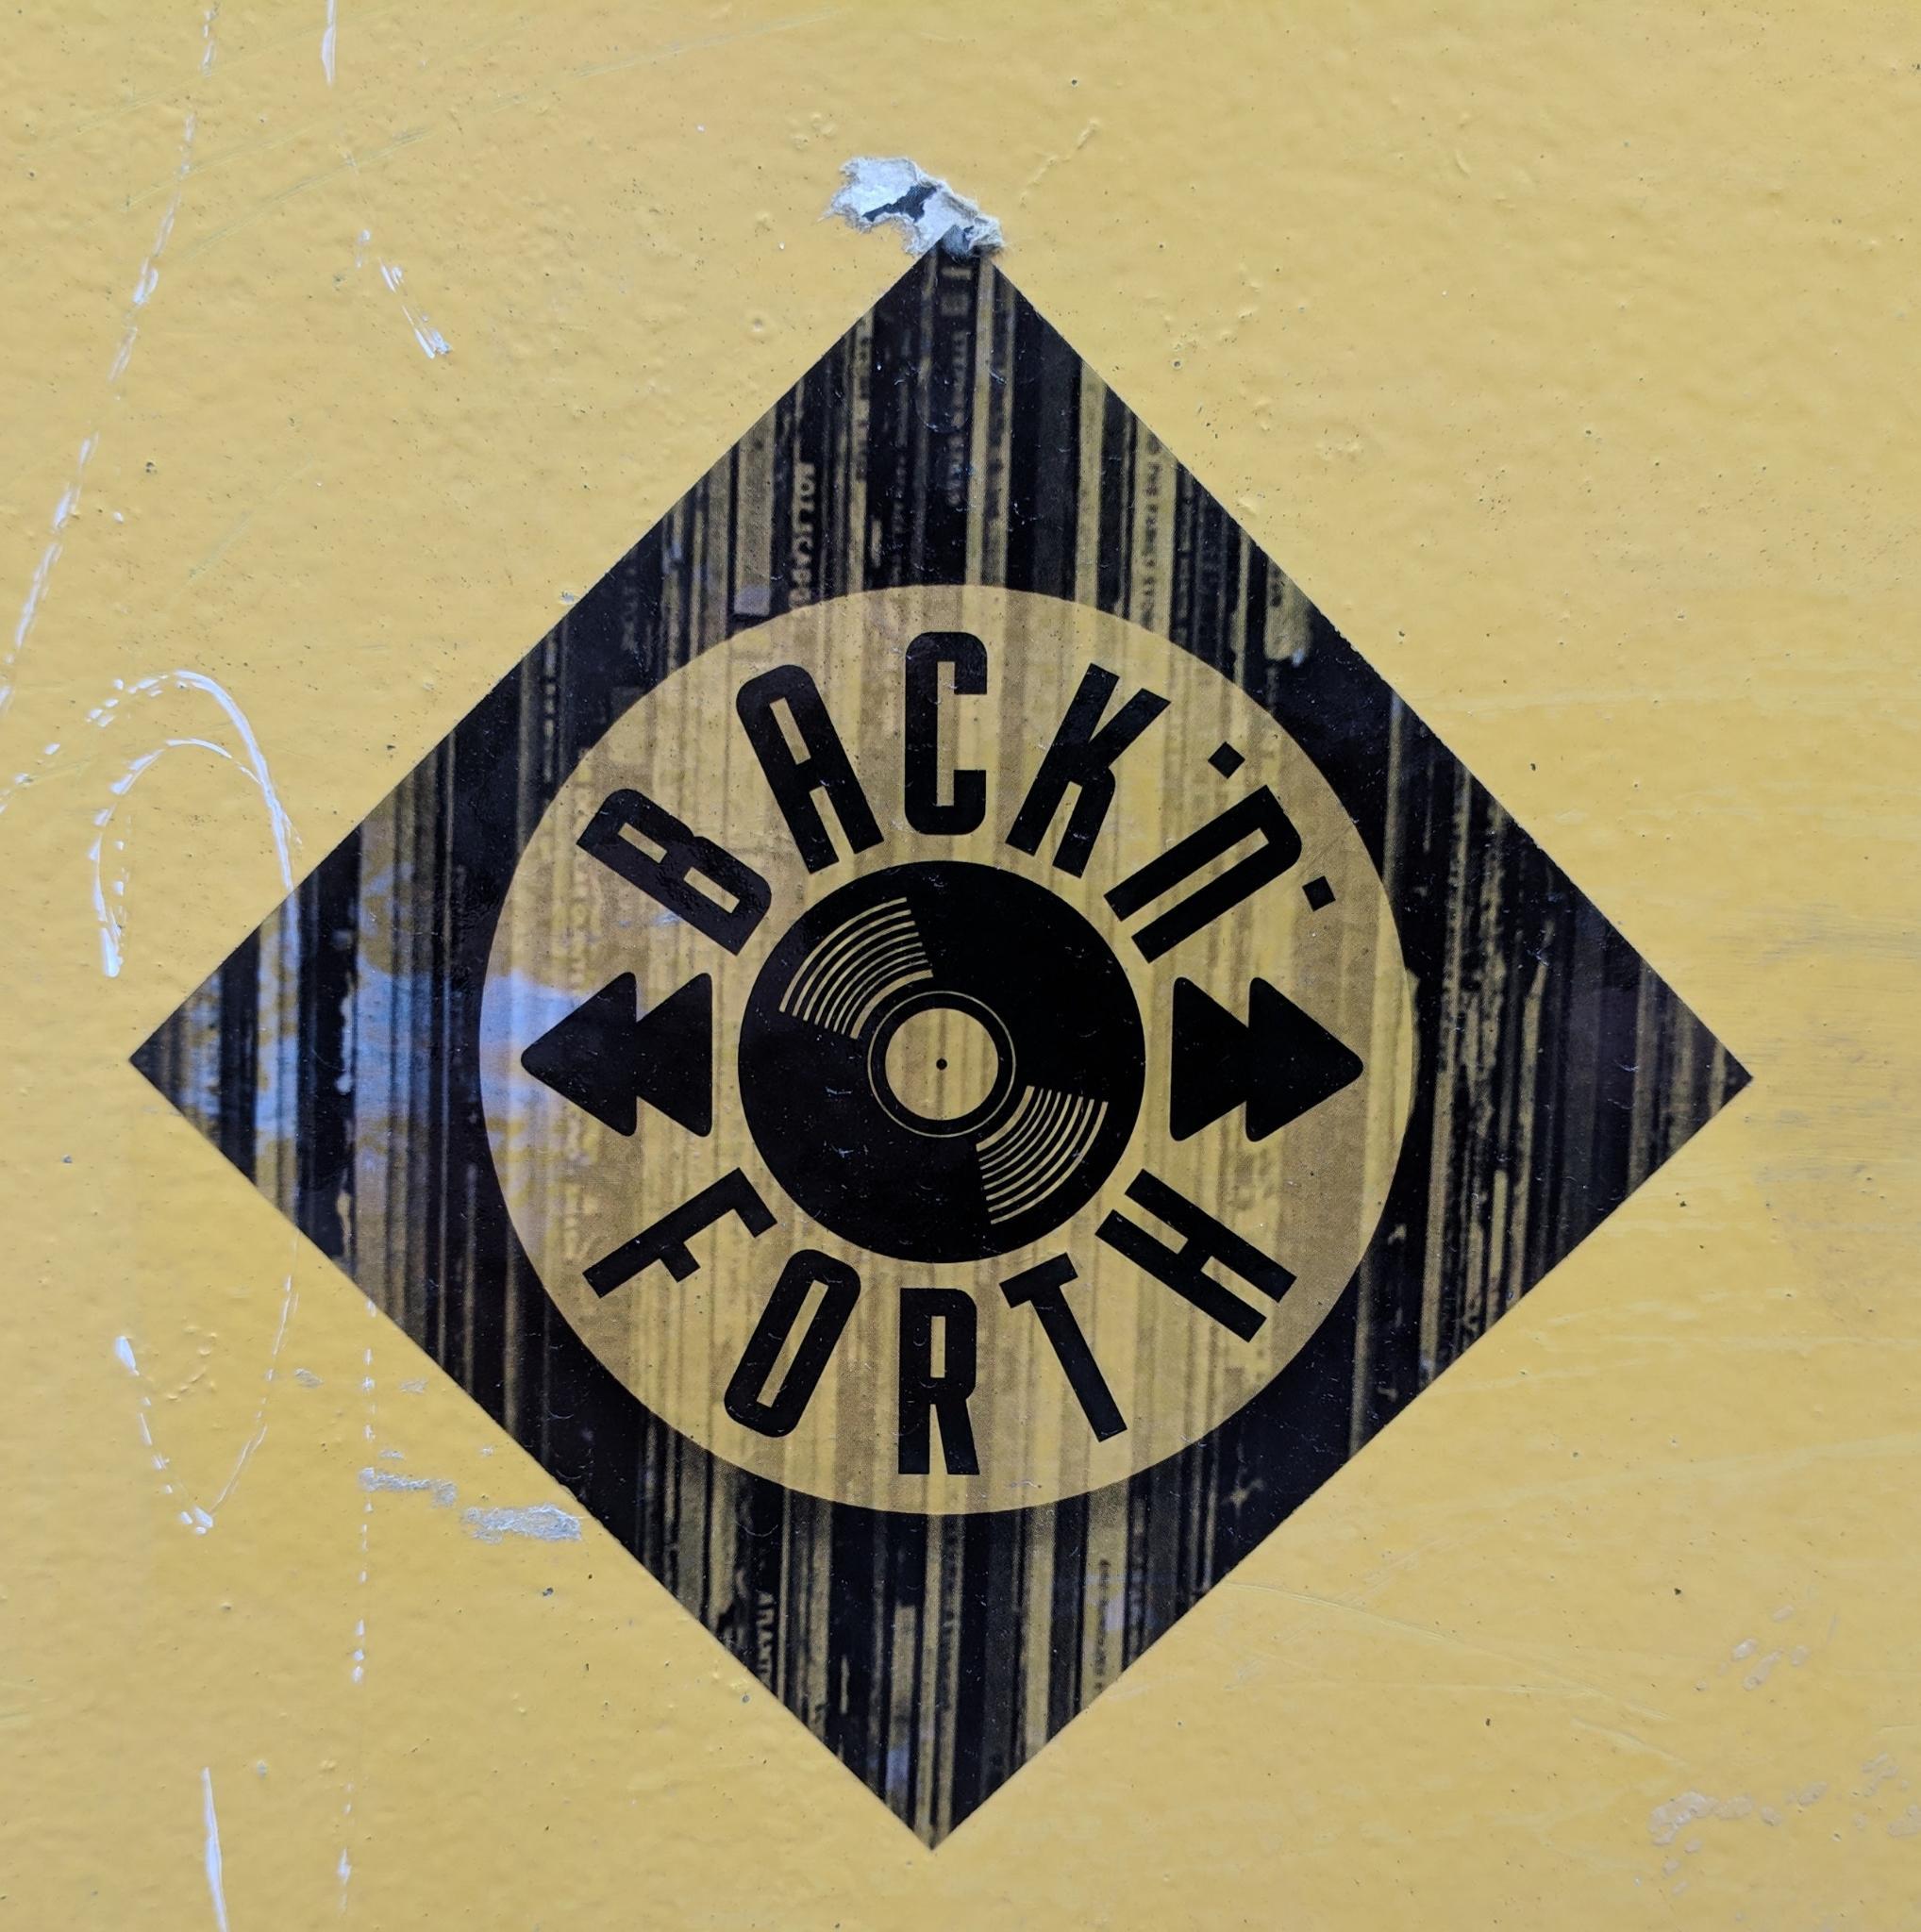 BACK'N'FORTH Radio Show (Banner)